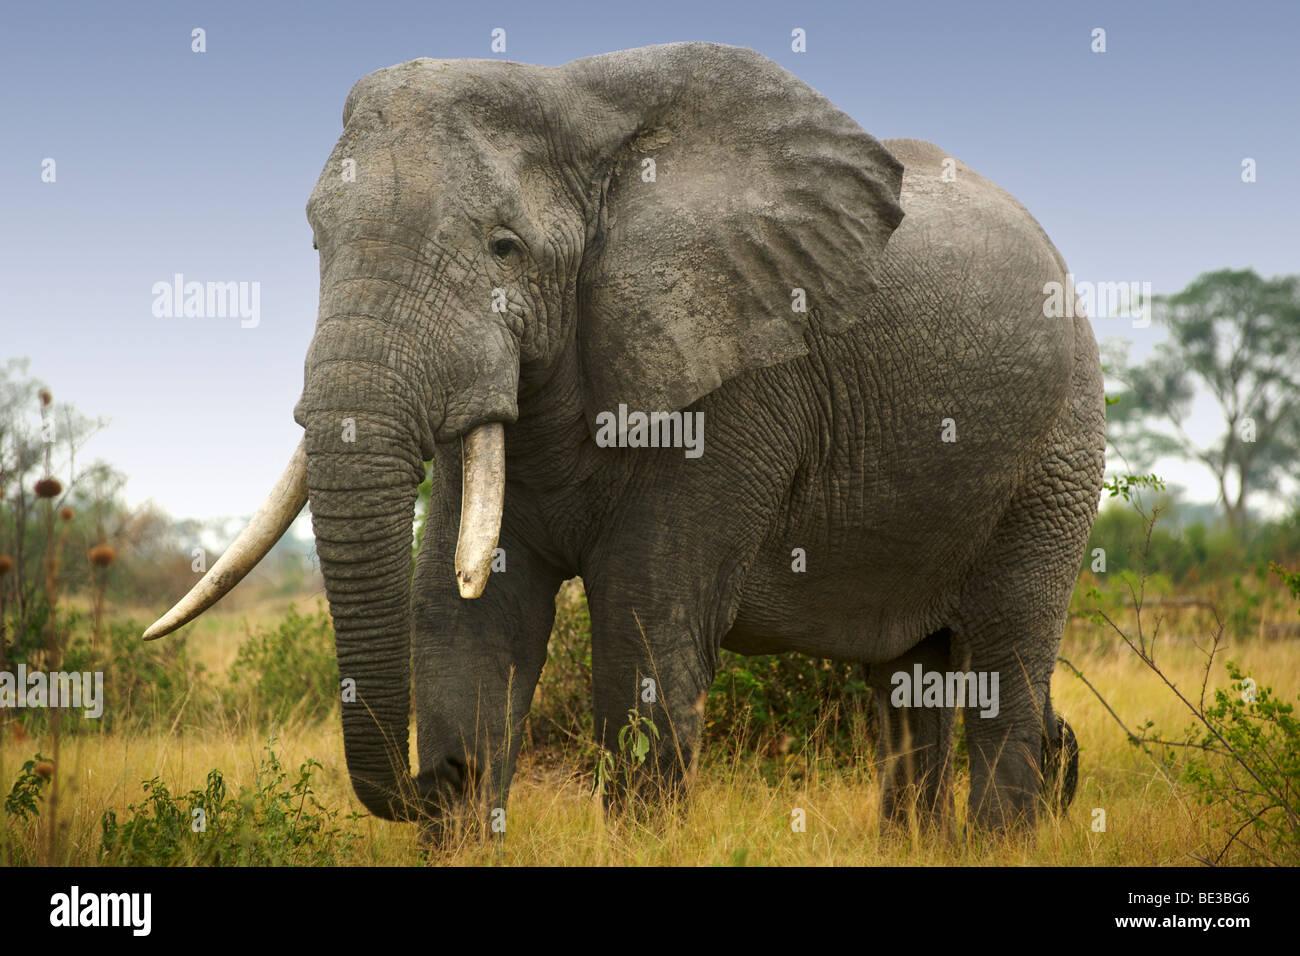 Elephant (Loxodonta Africana) à Ishasha dans le Parc national Queen Elizabeth en Ouganda. Photo Stock